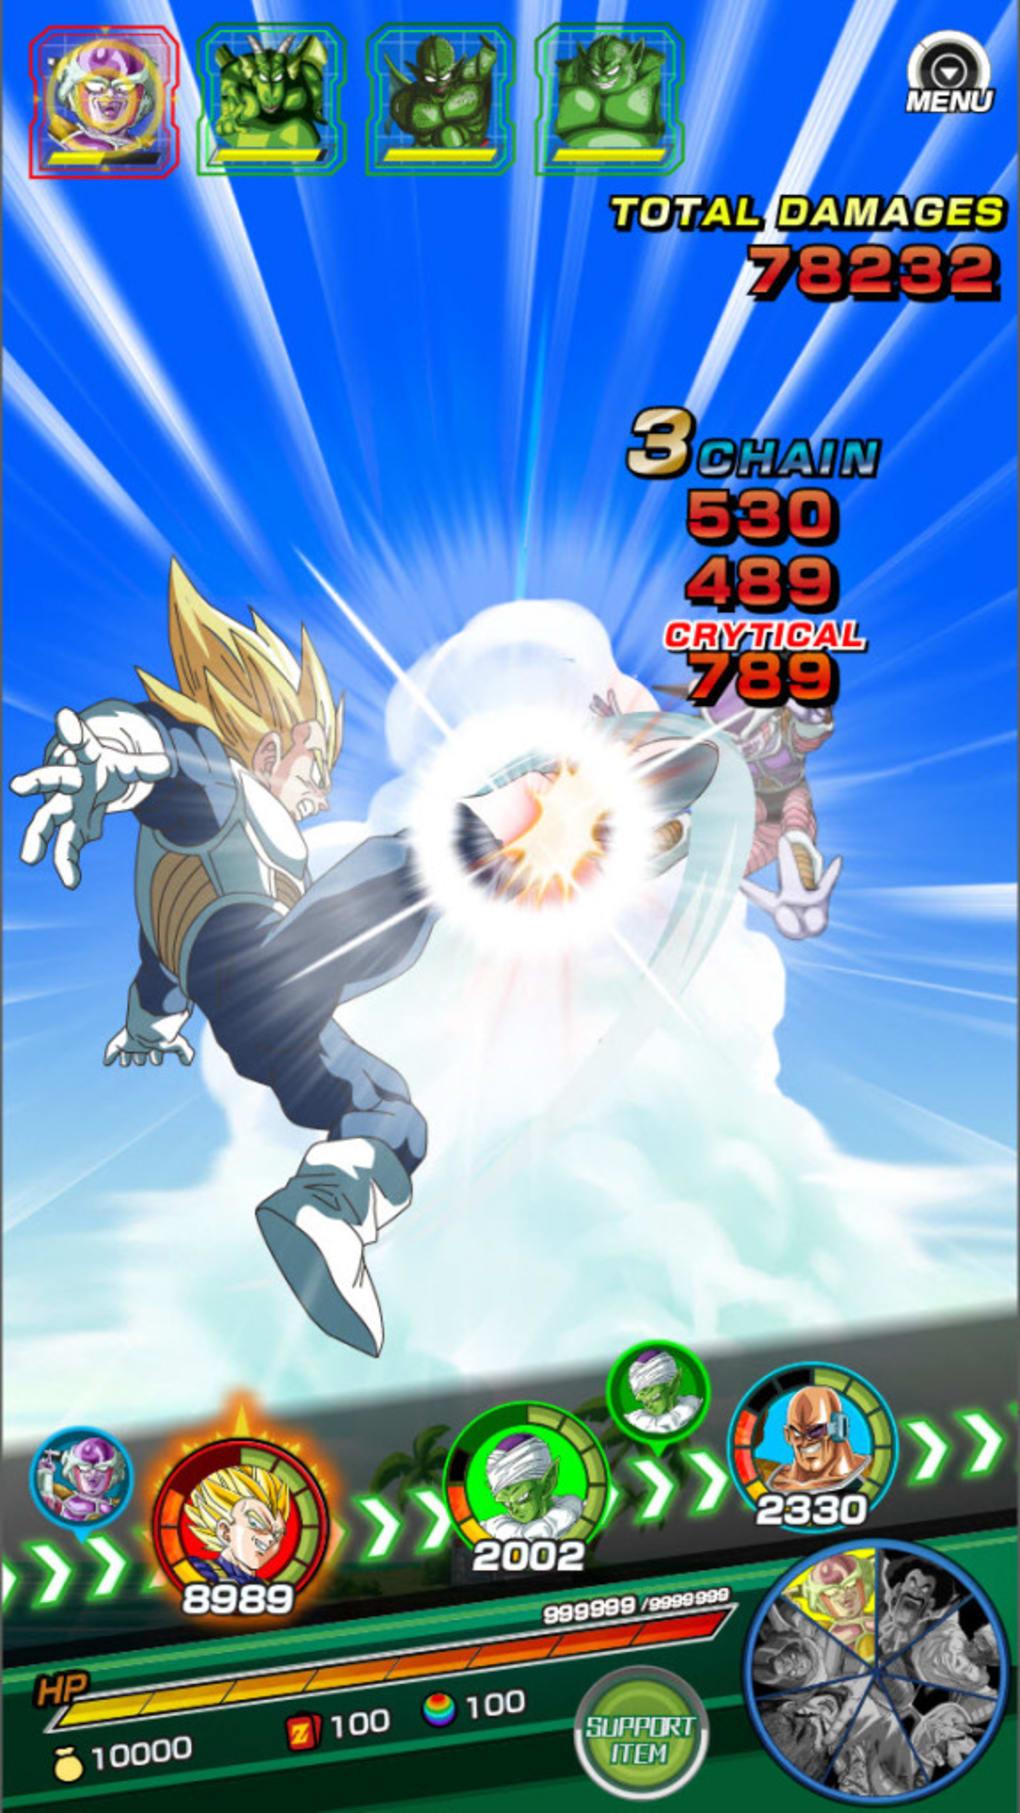 Dokkan battle jp apk iphone | Dragon Ball Z Dokkan Battle JP